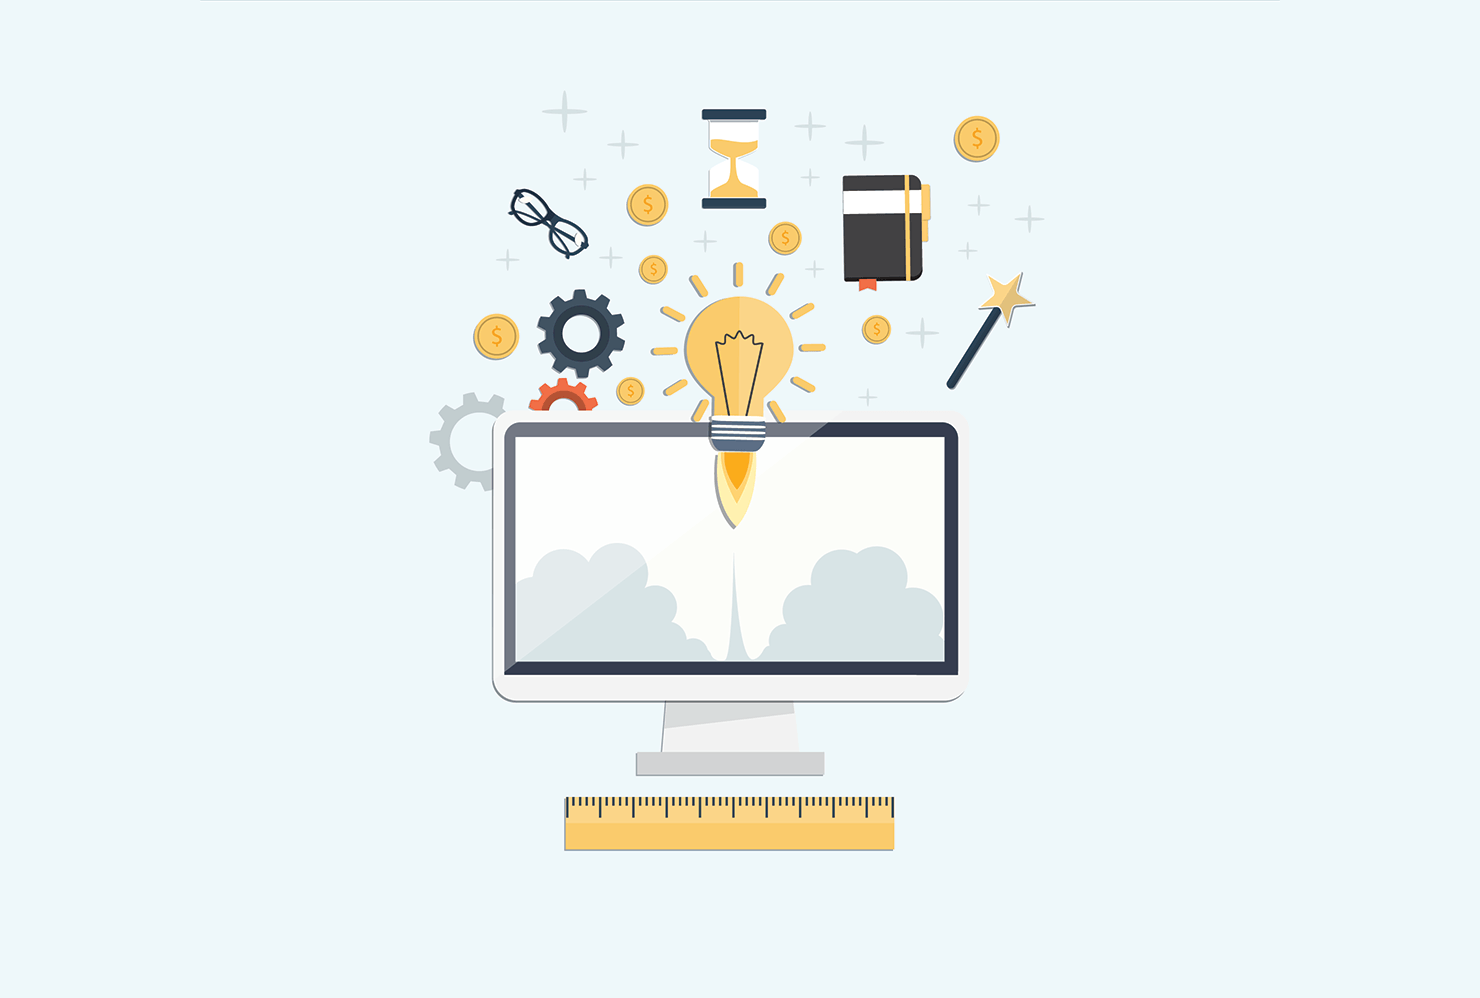 7c60a090ee 10 tips när du ska starta webshop - Driva webshop